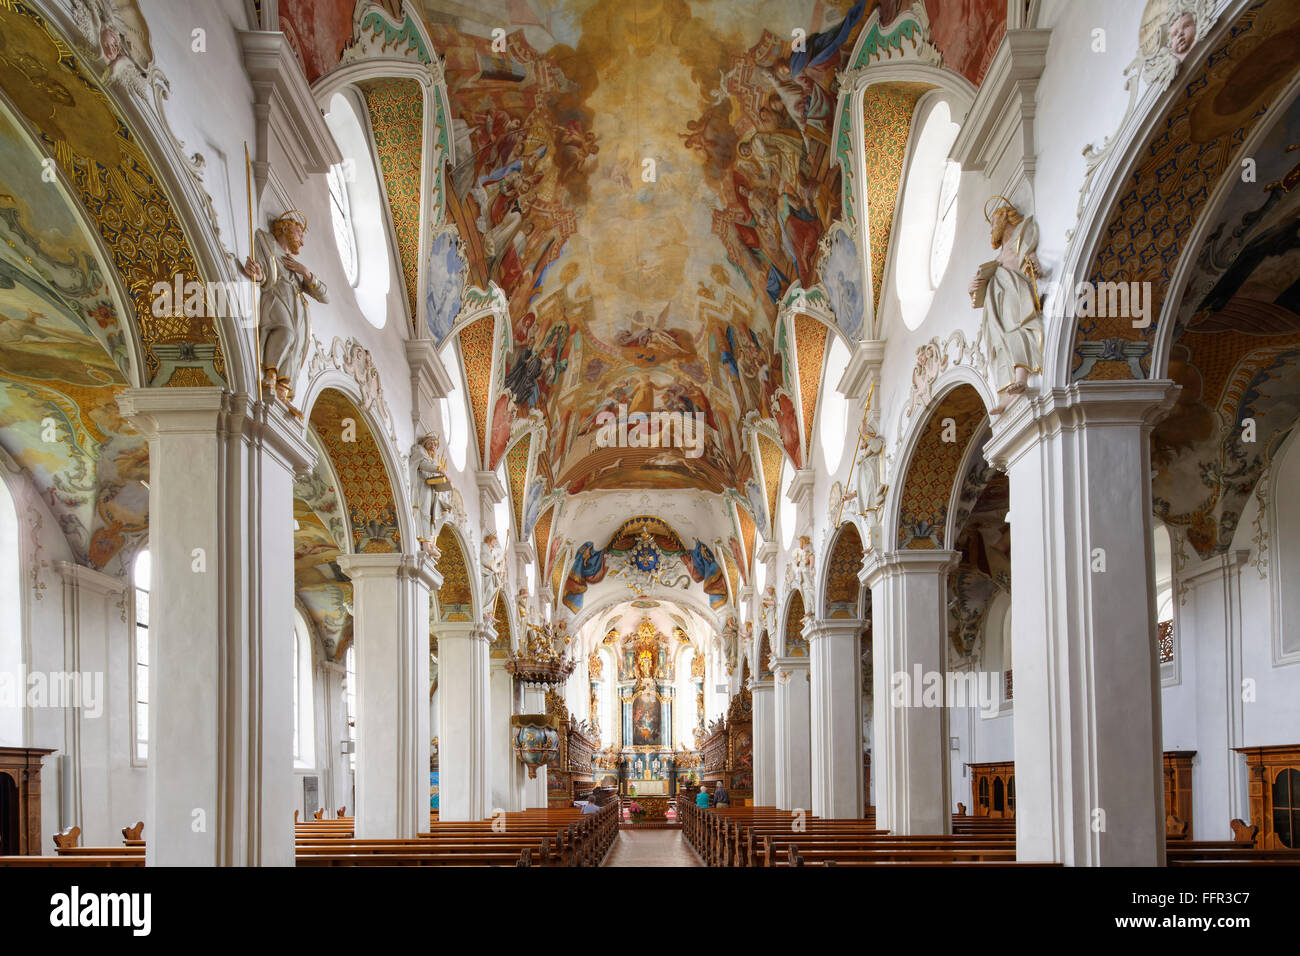 Klosterkirche St. Magnus with ceiling fresco, Schussenried Abbey, Bad Schussenried, Upper Swabia, Swabia, Baden - Stock Image